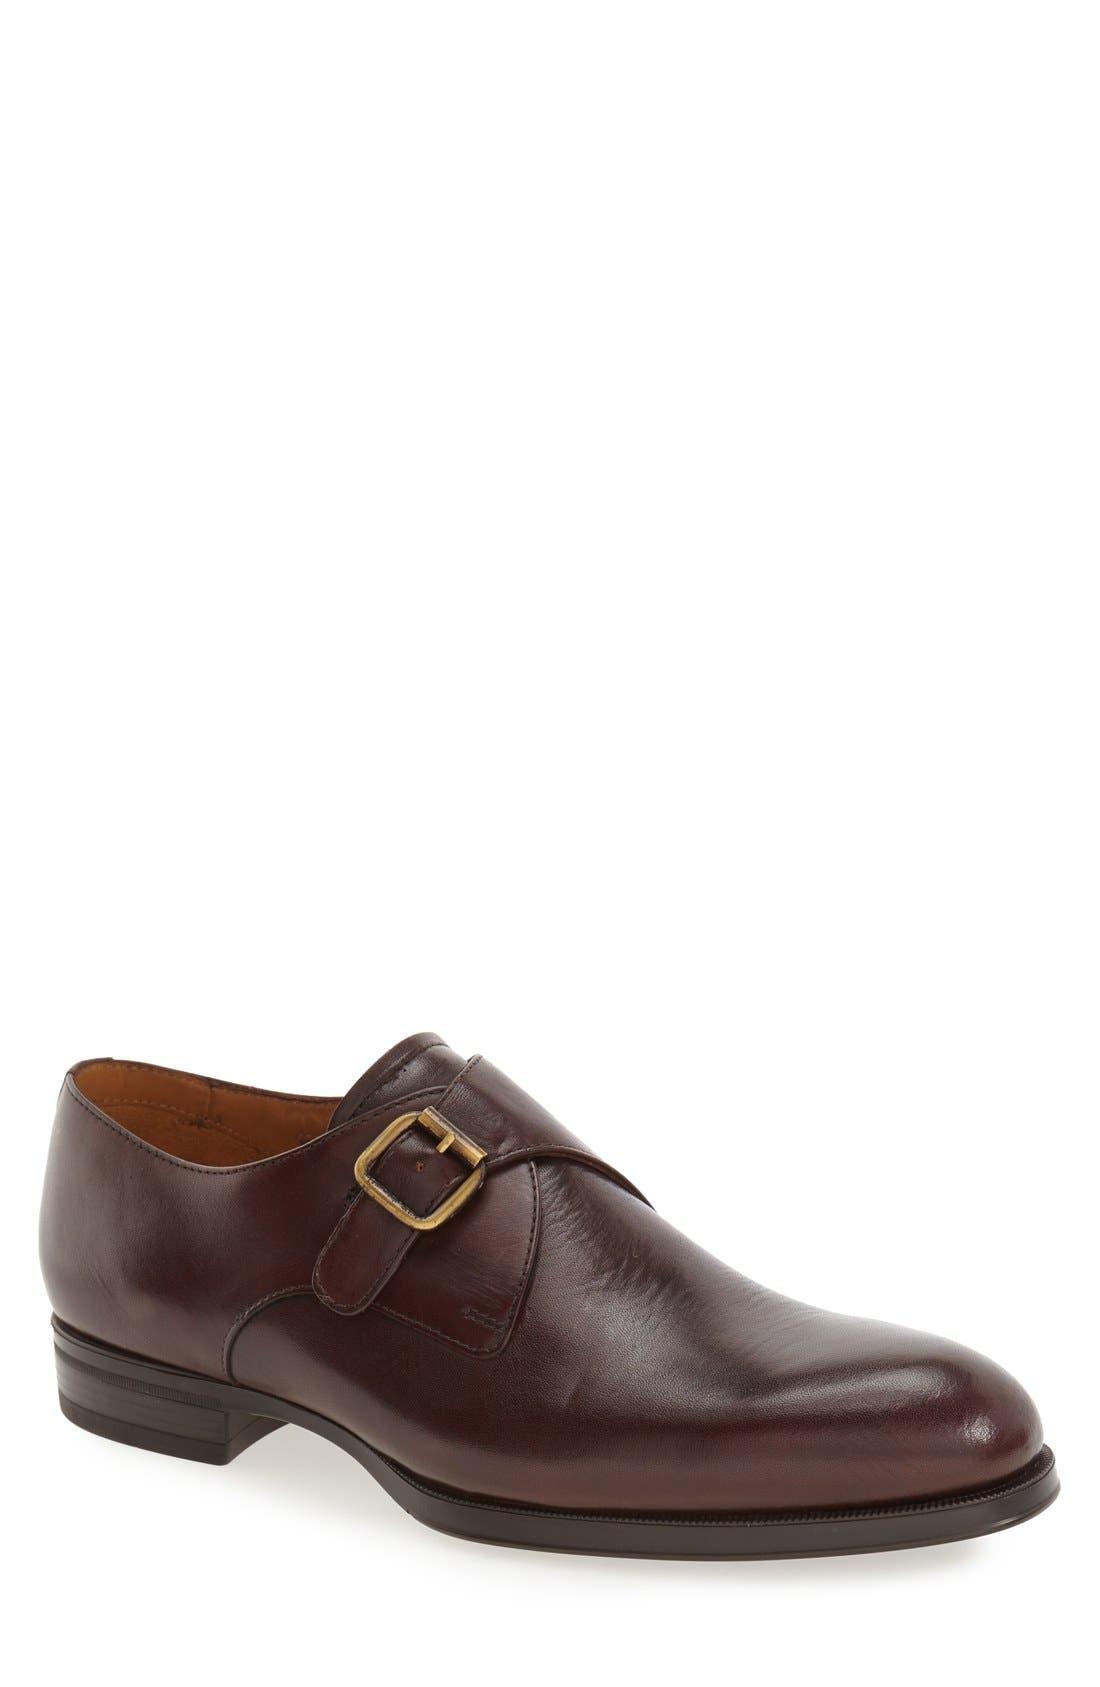 'Trifolo' Monk Strap Shoe,                             Main thumbnail 1, color,                             Dark Woodbury Leather